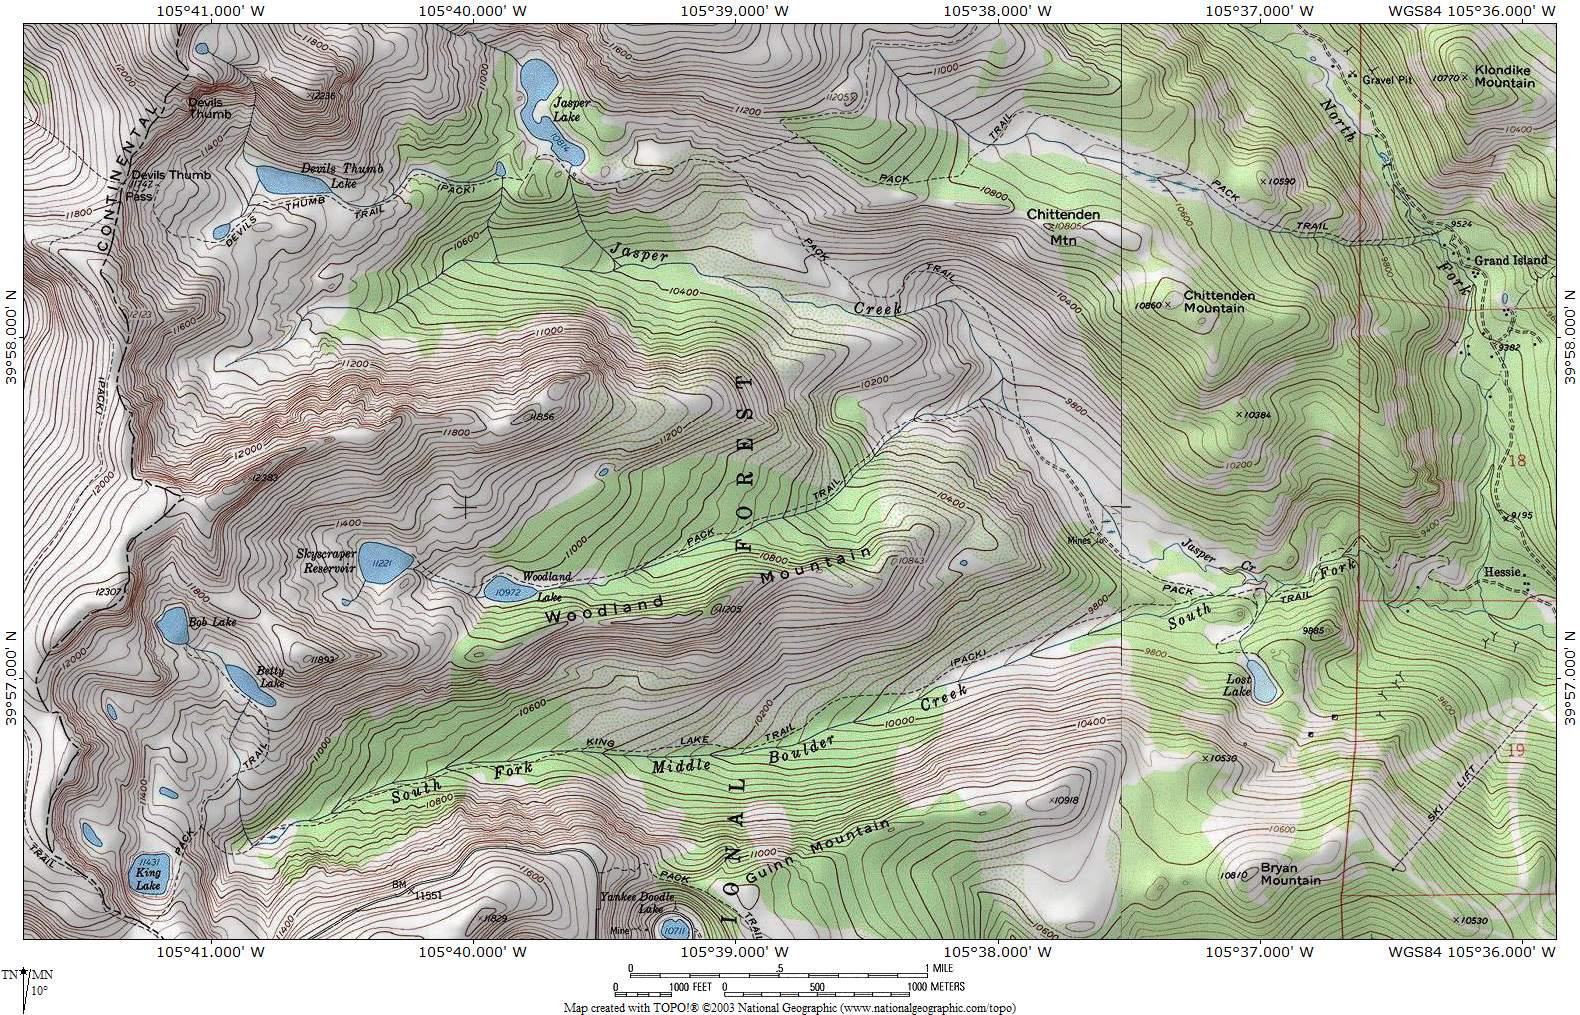 ProTrails   Devils Thumb Lake, Trail Map, Hessie Trailhead ... on mt. mitchell trail, castle rock trail, alaska trail, slick rock trail, boundary peak trail, black mountain trail, redwood creek trail, mount juneau trail, niagara gorge trail, camelback mountain trail,